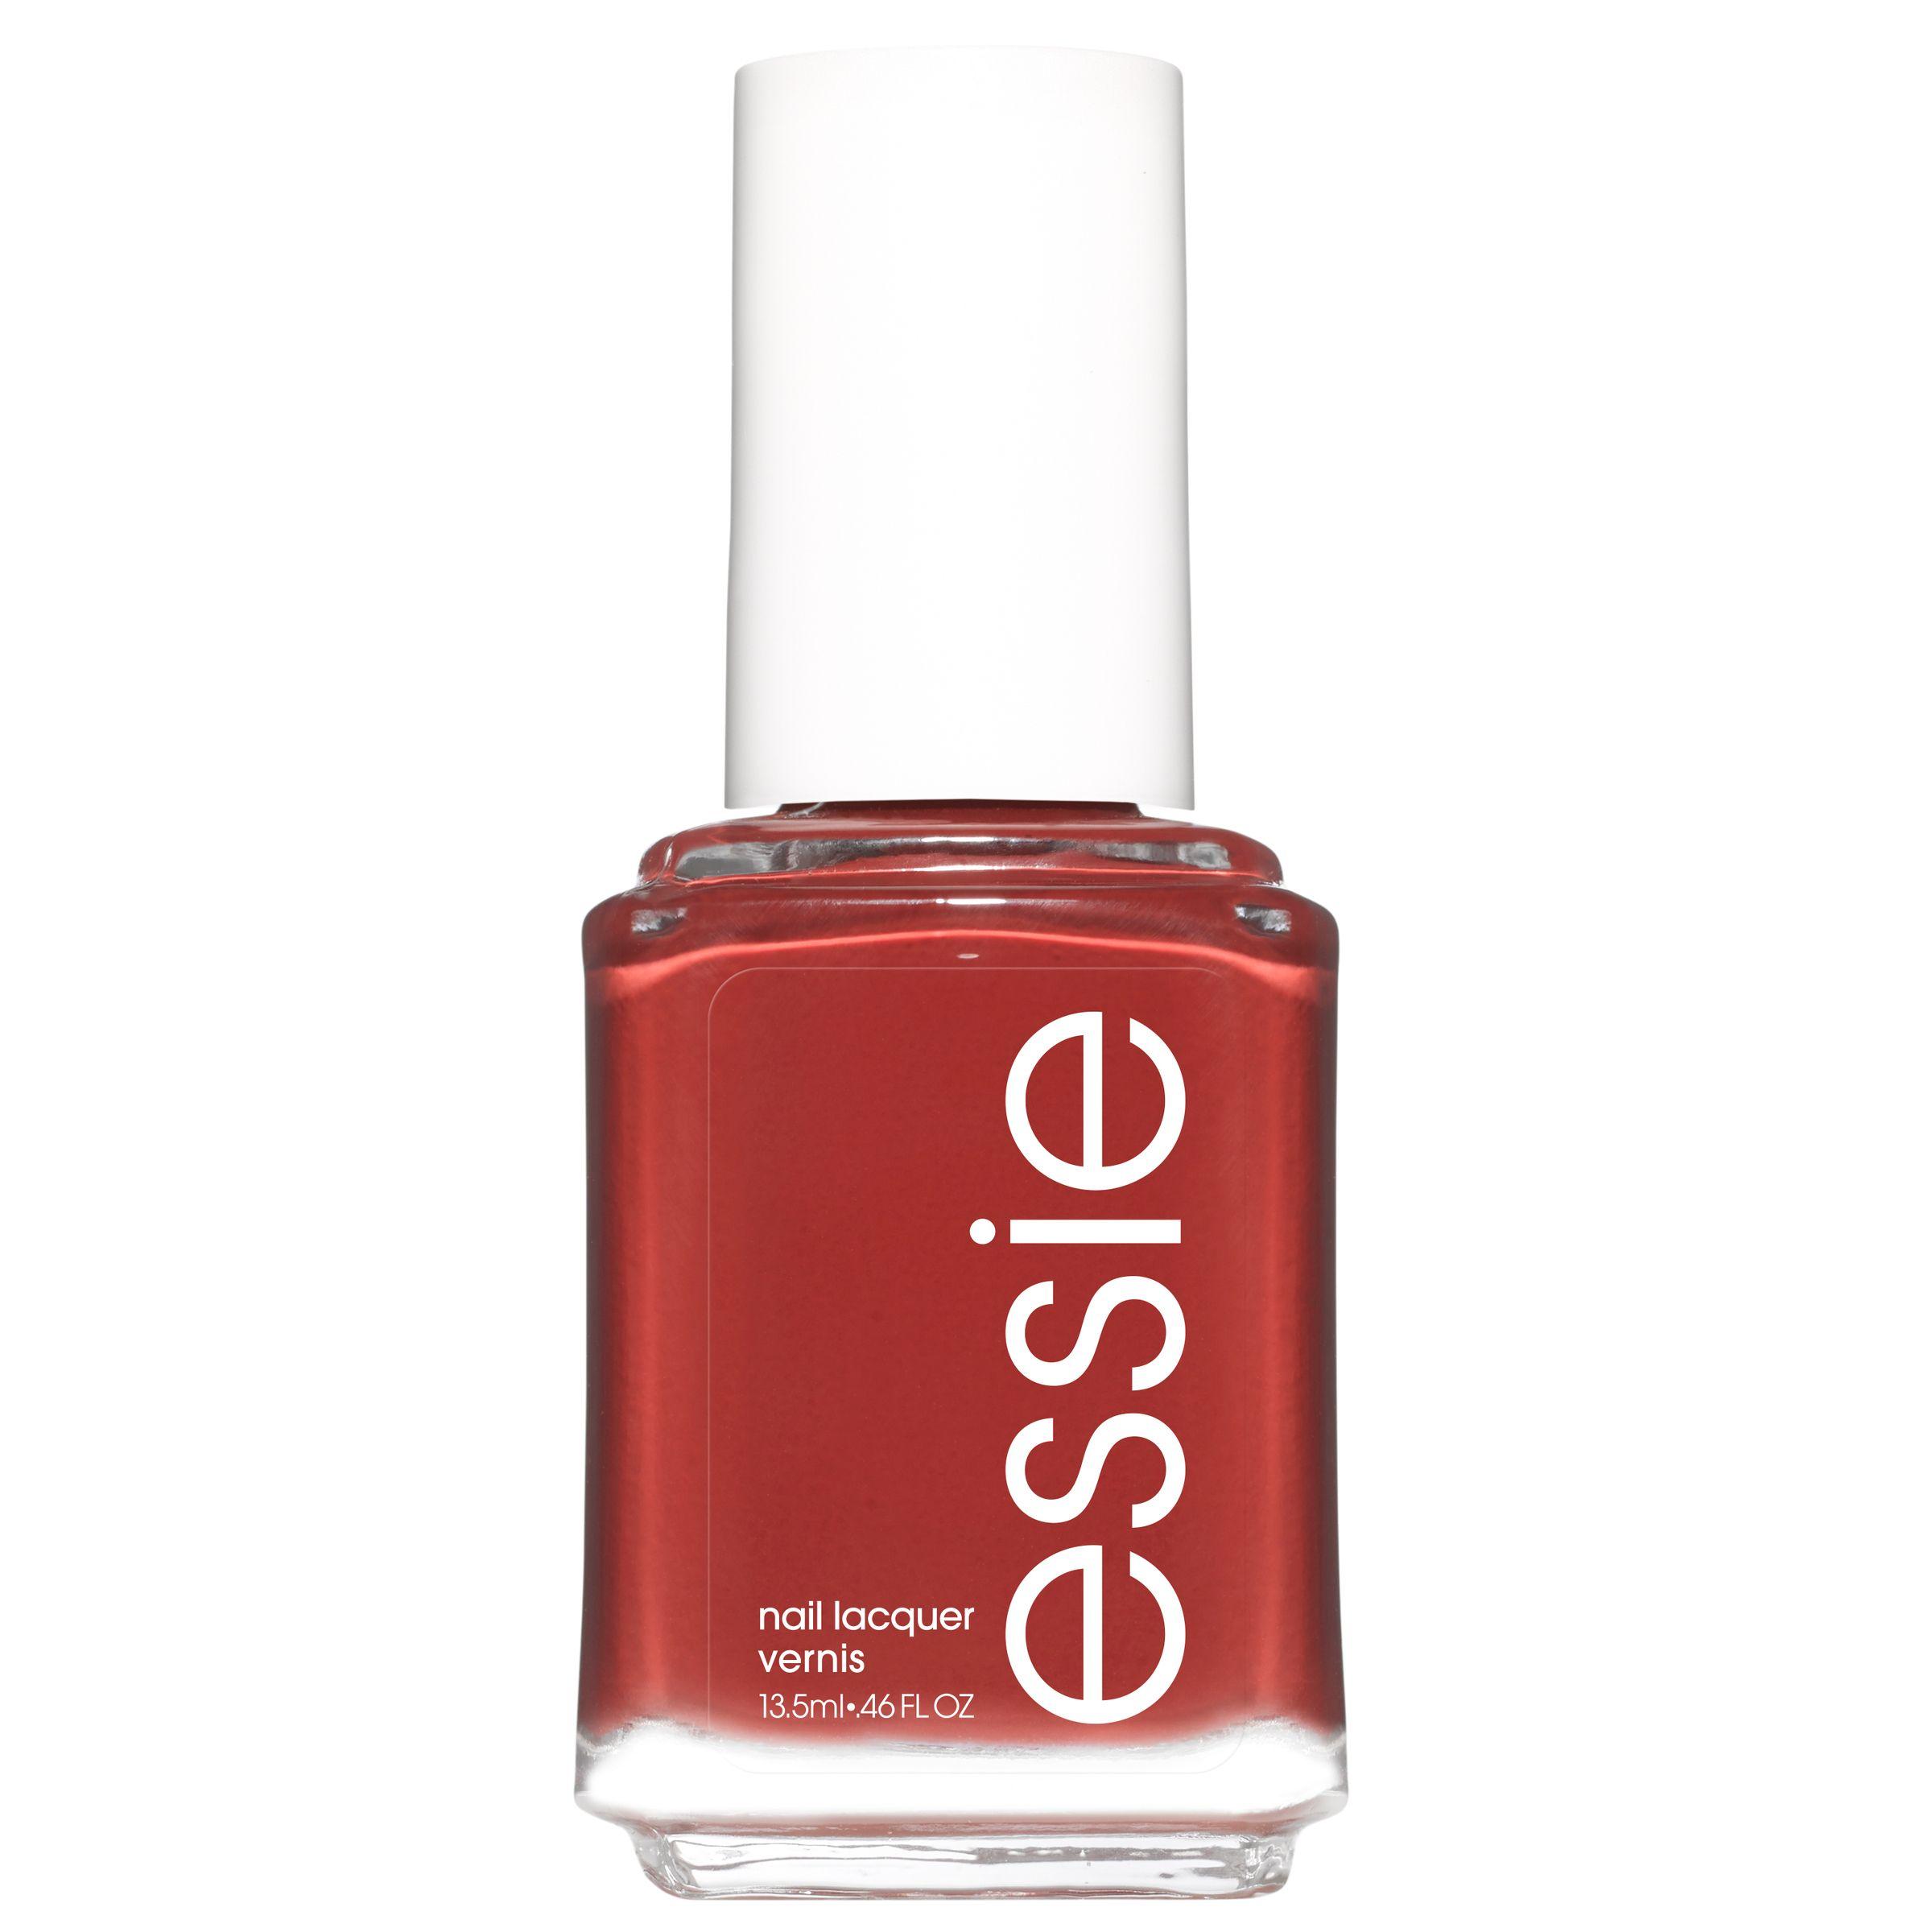 Beauty Essie nail polish